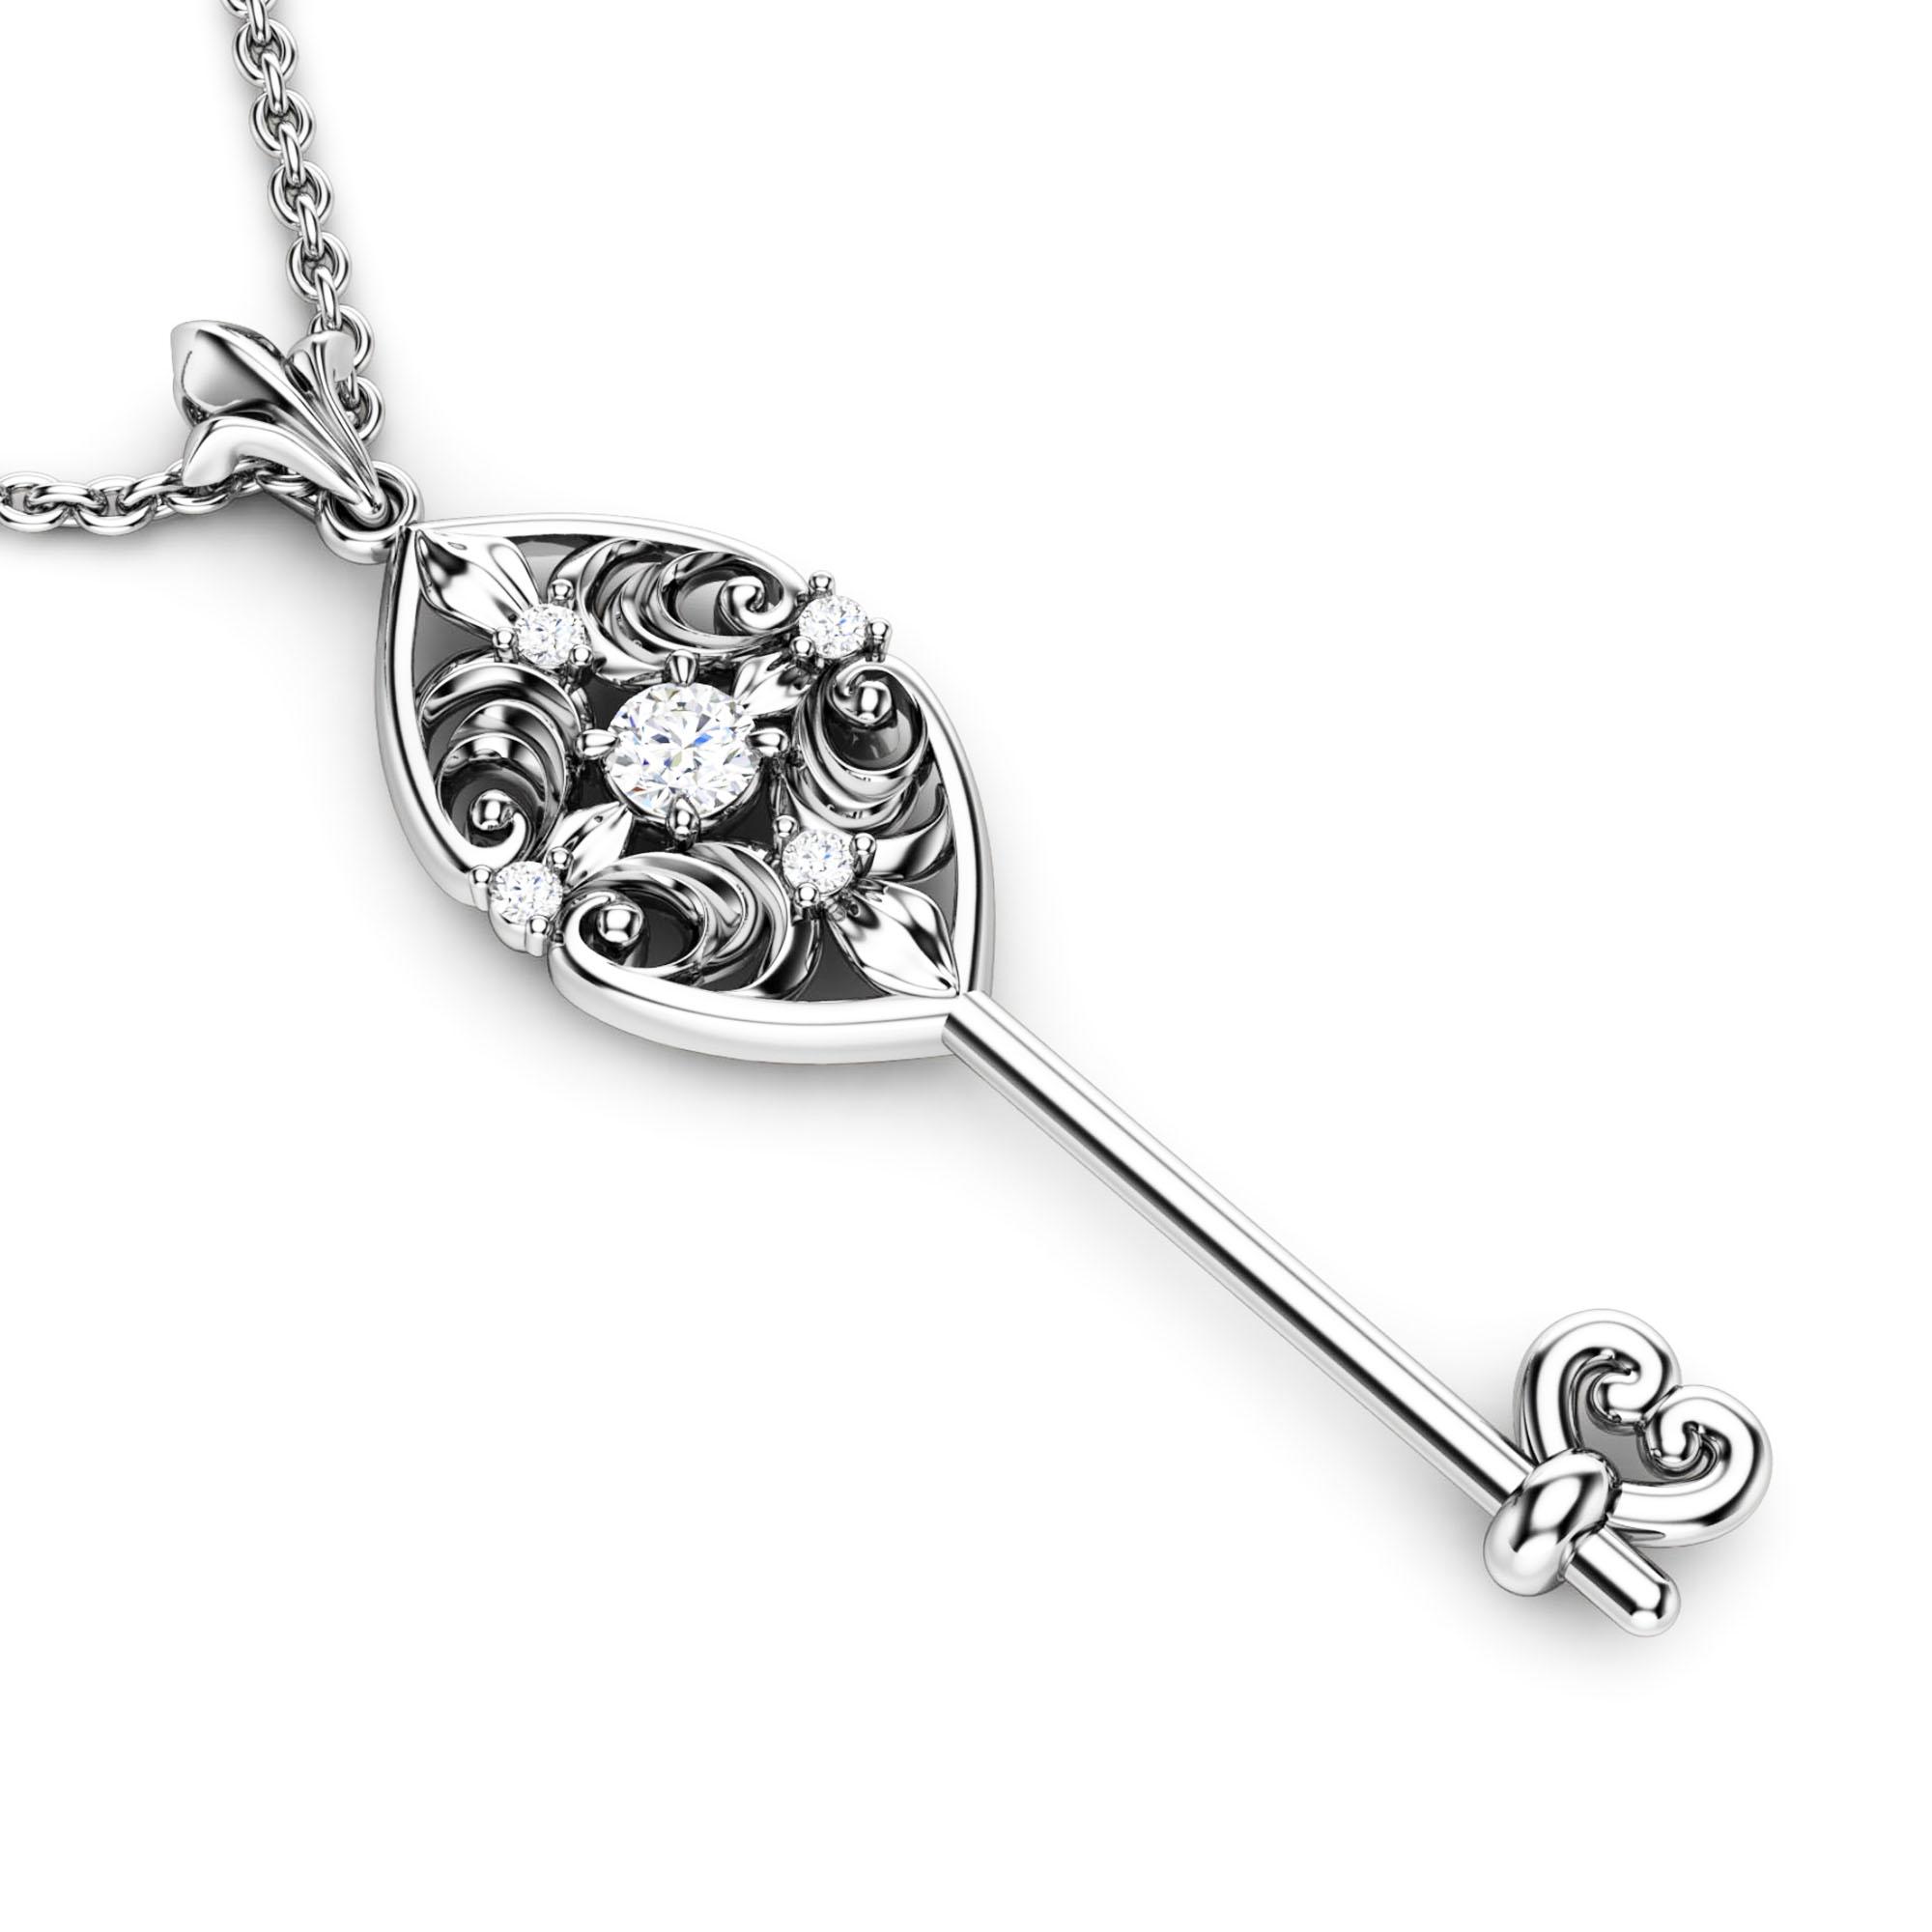 Genuine Natural Diamonds Key Pendant Edwardian Diamonds Key Pendant Necklace Unique Diamonds Key Pendant